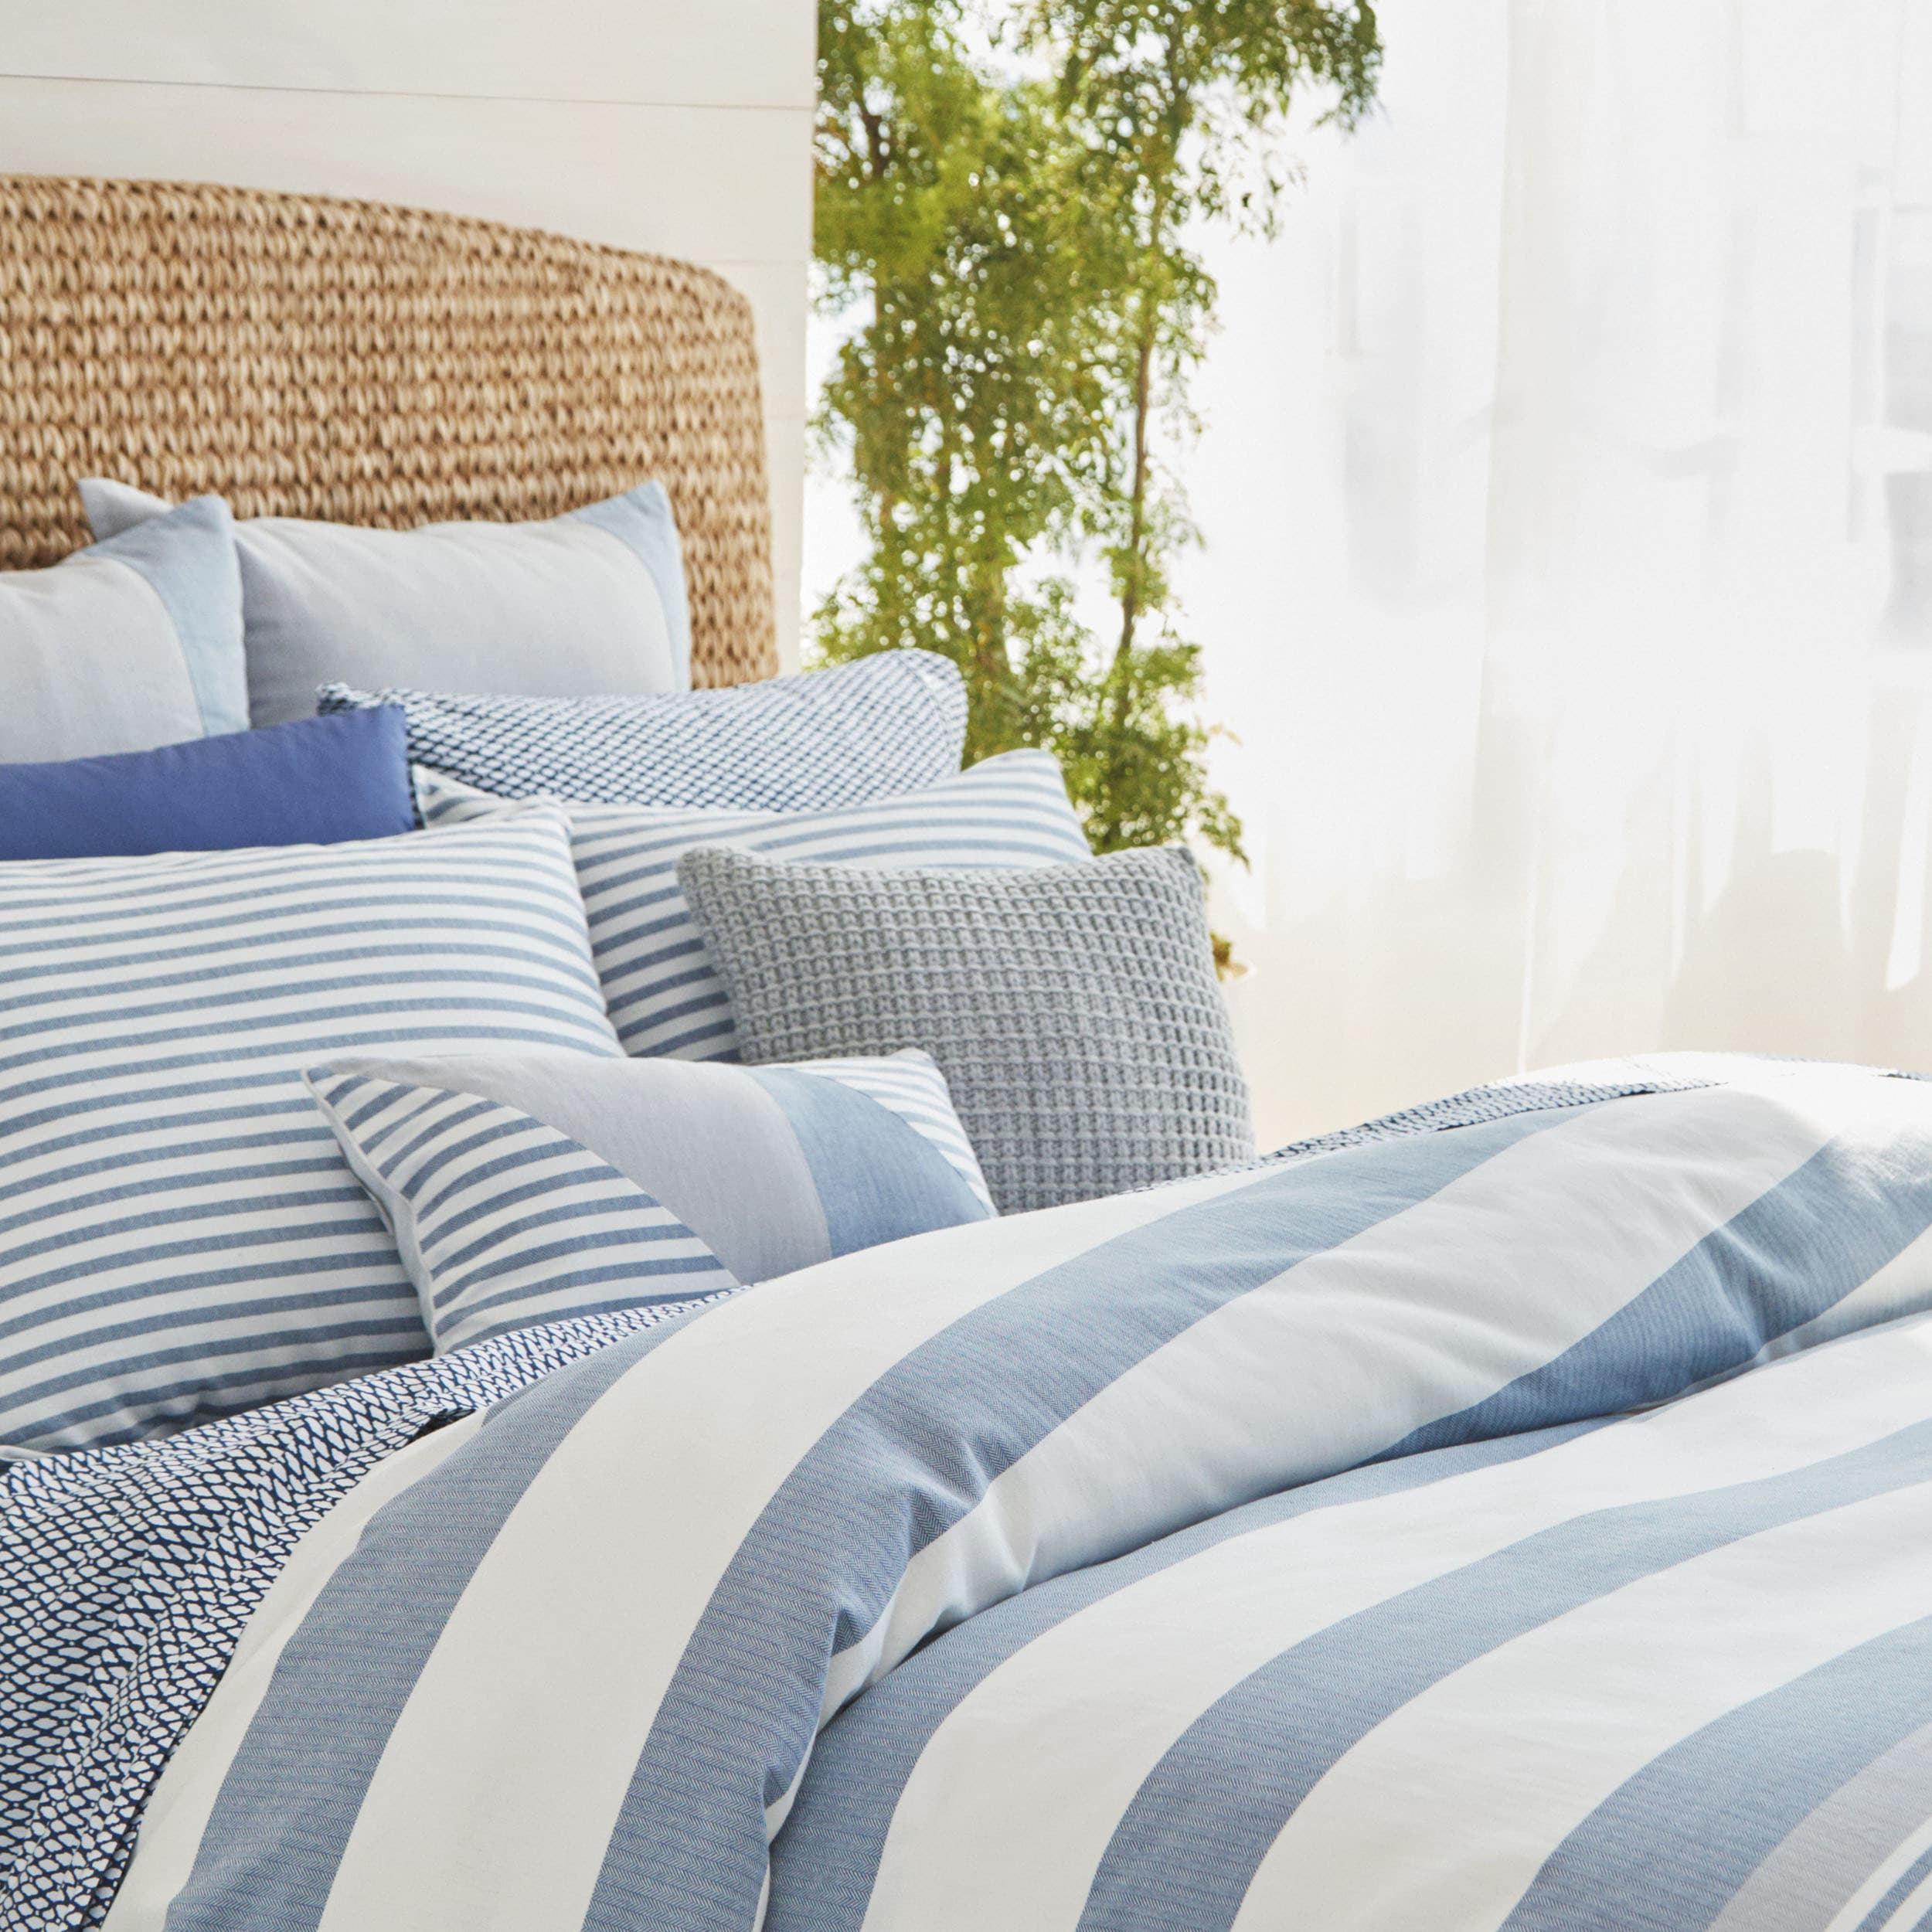 teenscream inspirations full color striking of vera teensice size comforters sets beach colored cream wang for foreenscream comforter coastal bedding image